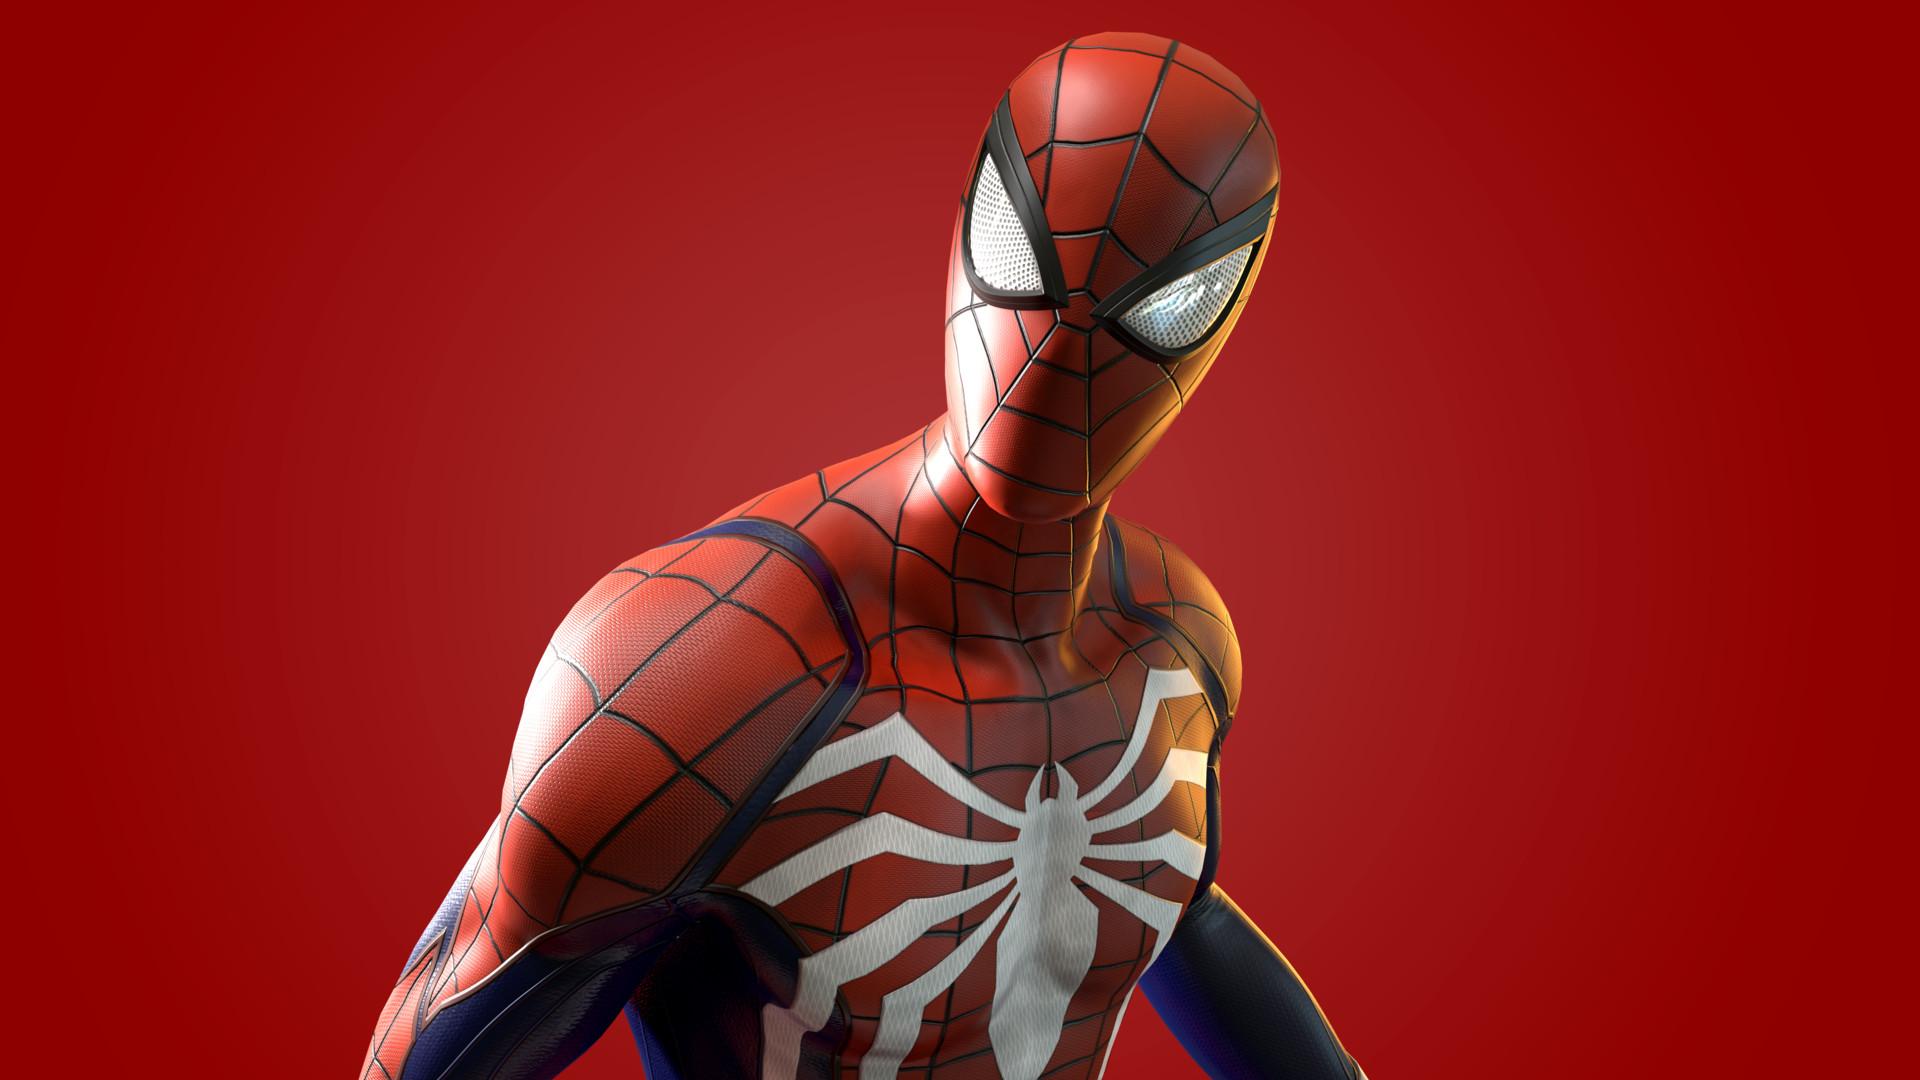 Marvel Spider Man Ps4 Fanart Hd Superheroes 4k Wallpapers Images